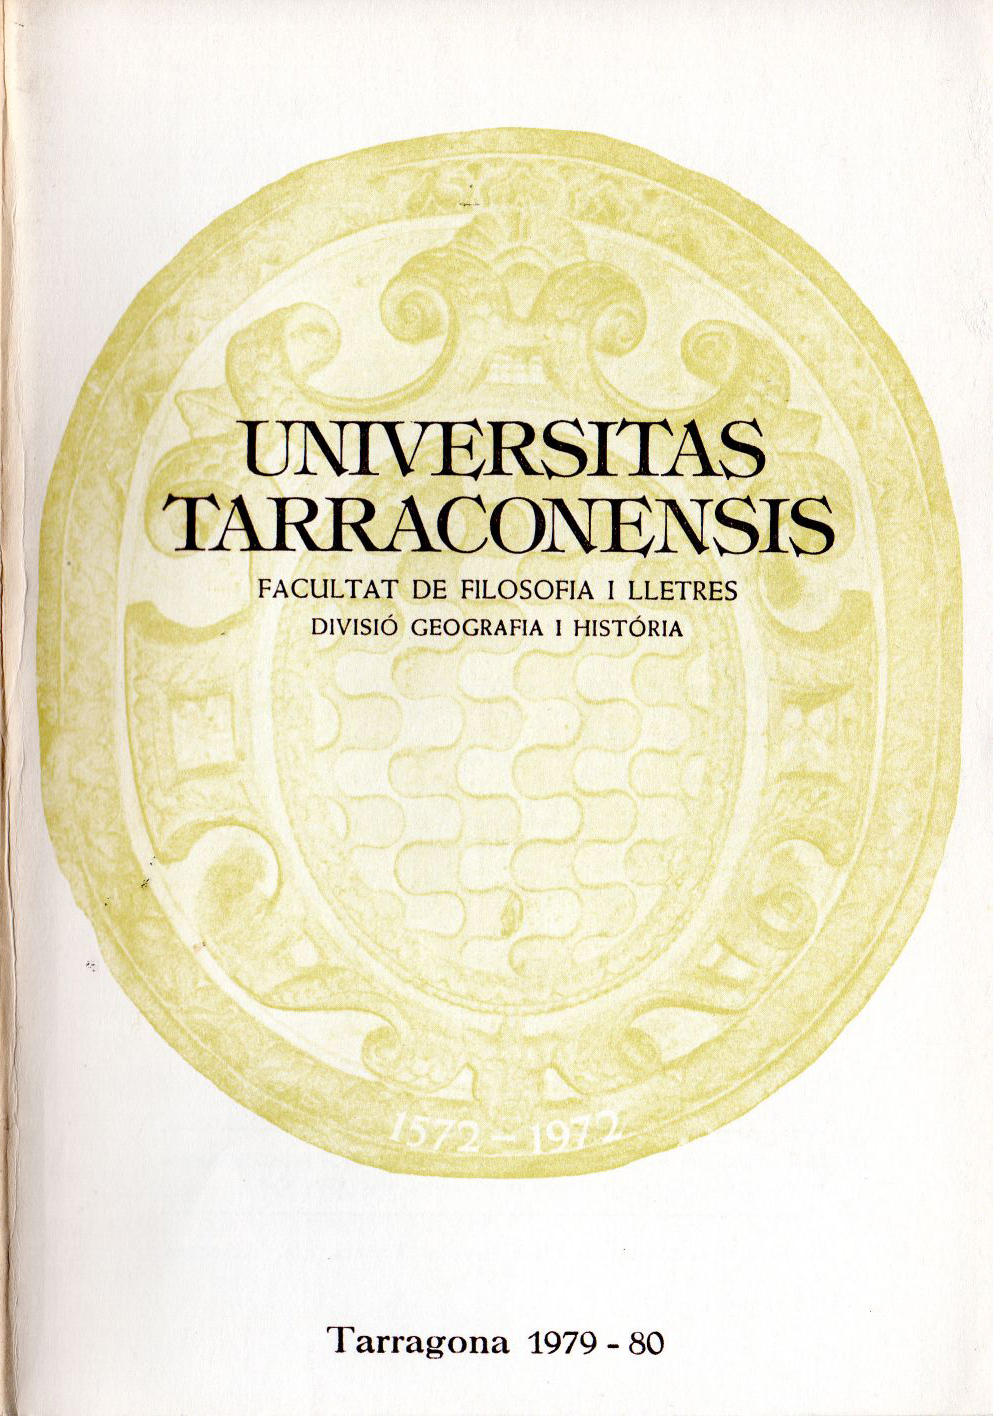 Universitas Tarraconensis. Revista de Geografia, Història i Filosofia. 1979-1980